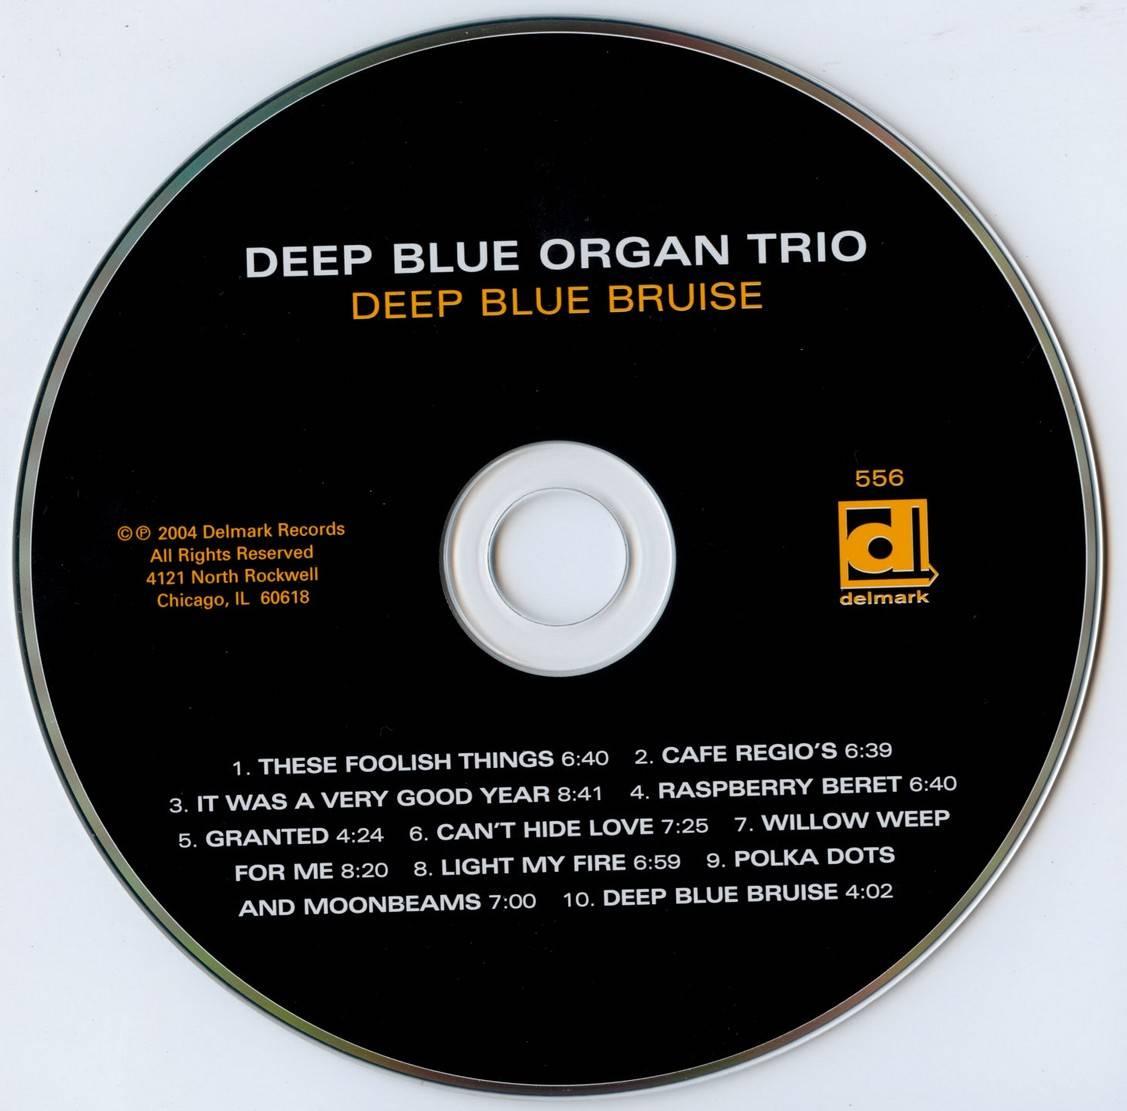 Deep Blue Organ Trio - Deep Blue Bruise (2004) {Delmark